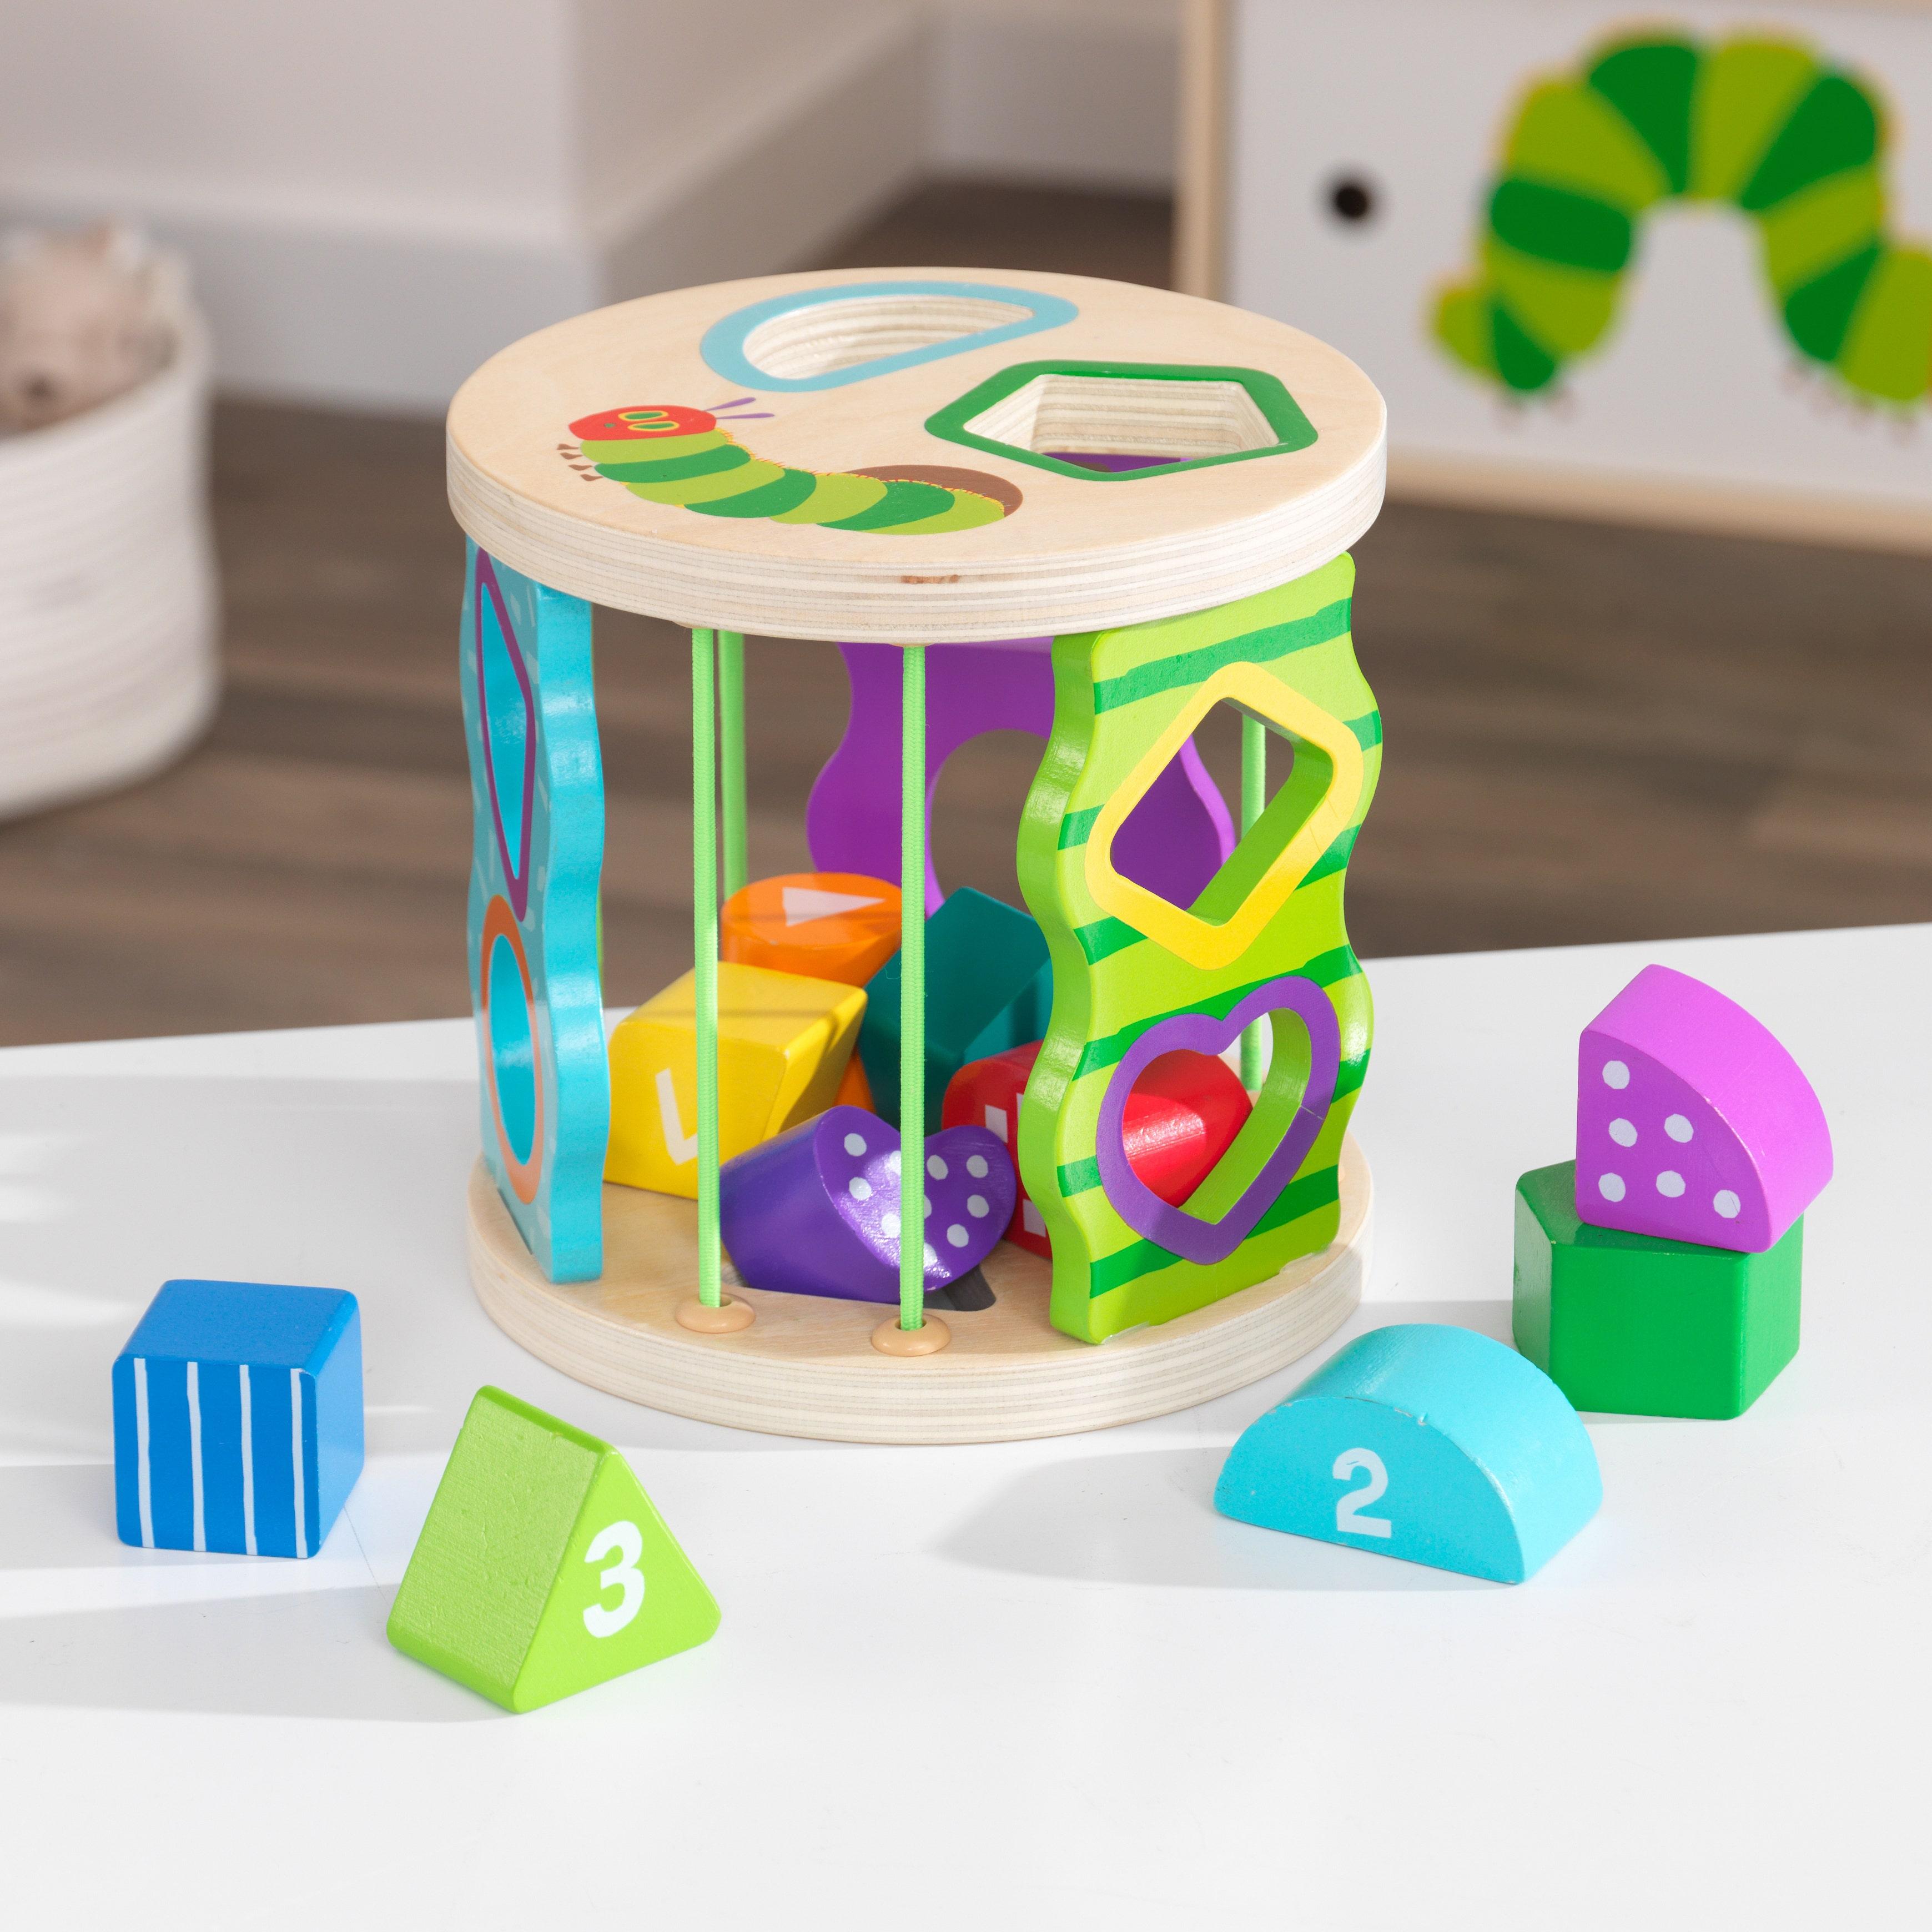 Preschool & Toddler Toys